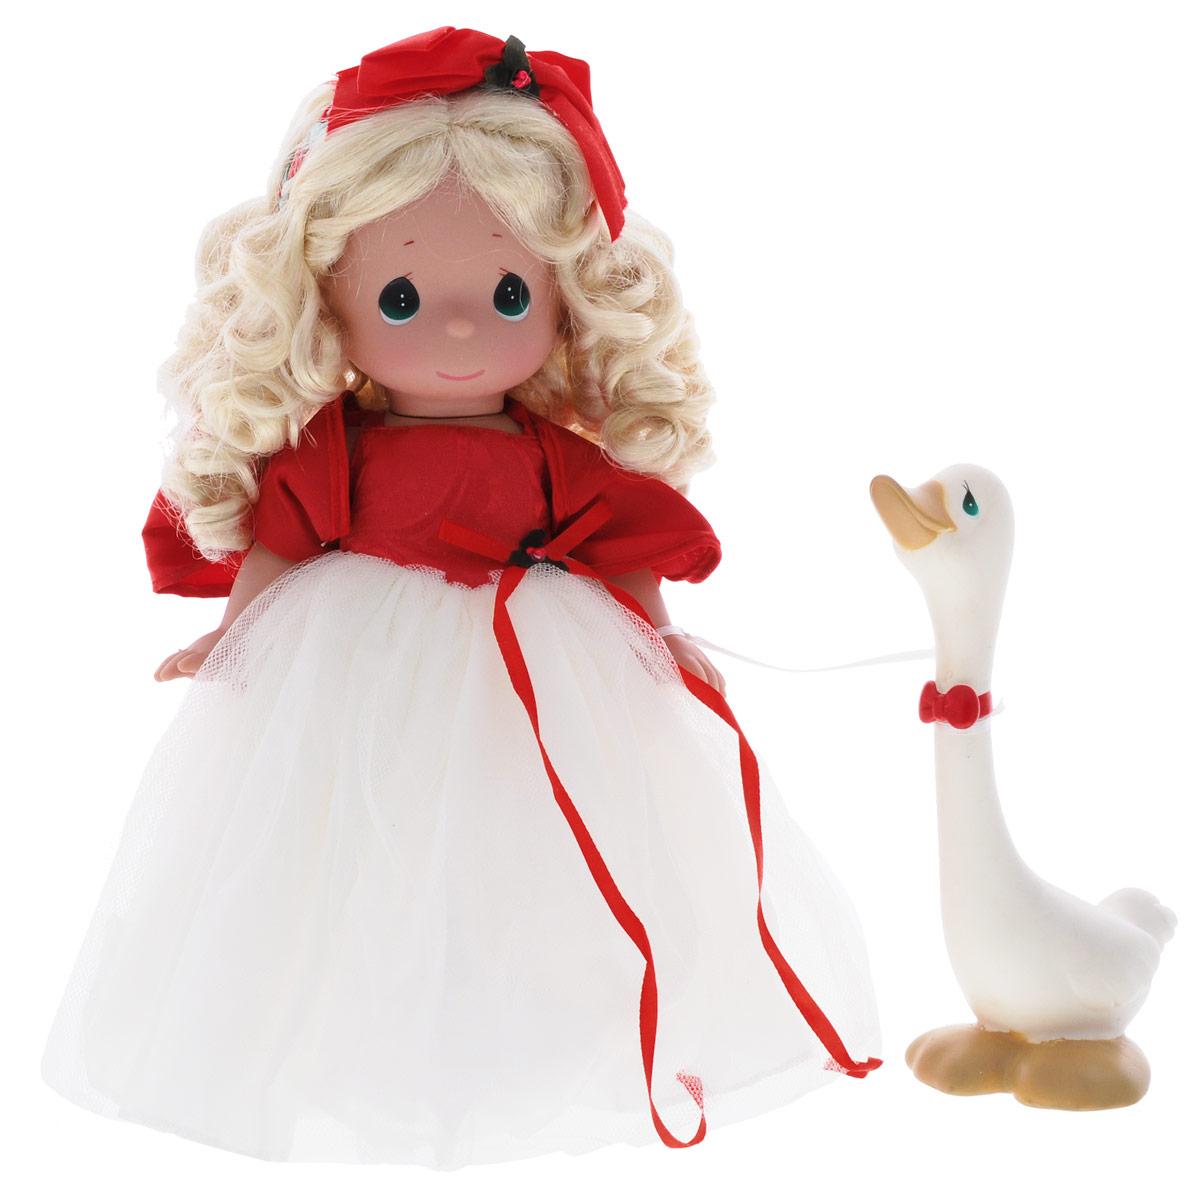 Precious Moments Кукла Сезон радости блондинка куклы и одежда для кукол precious кукла пастушка в розовом 14 см